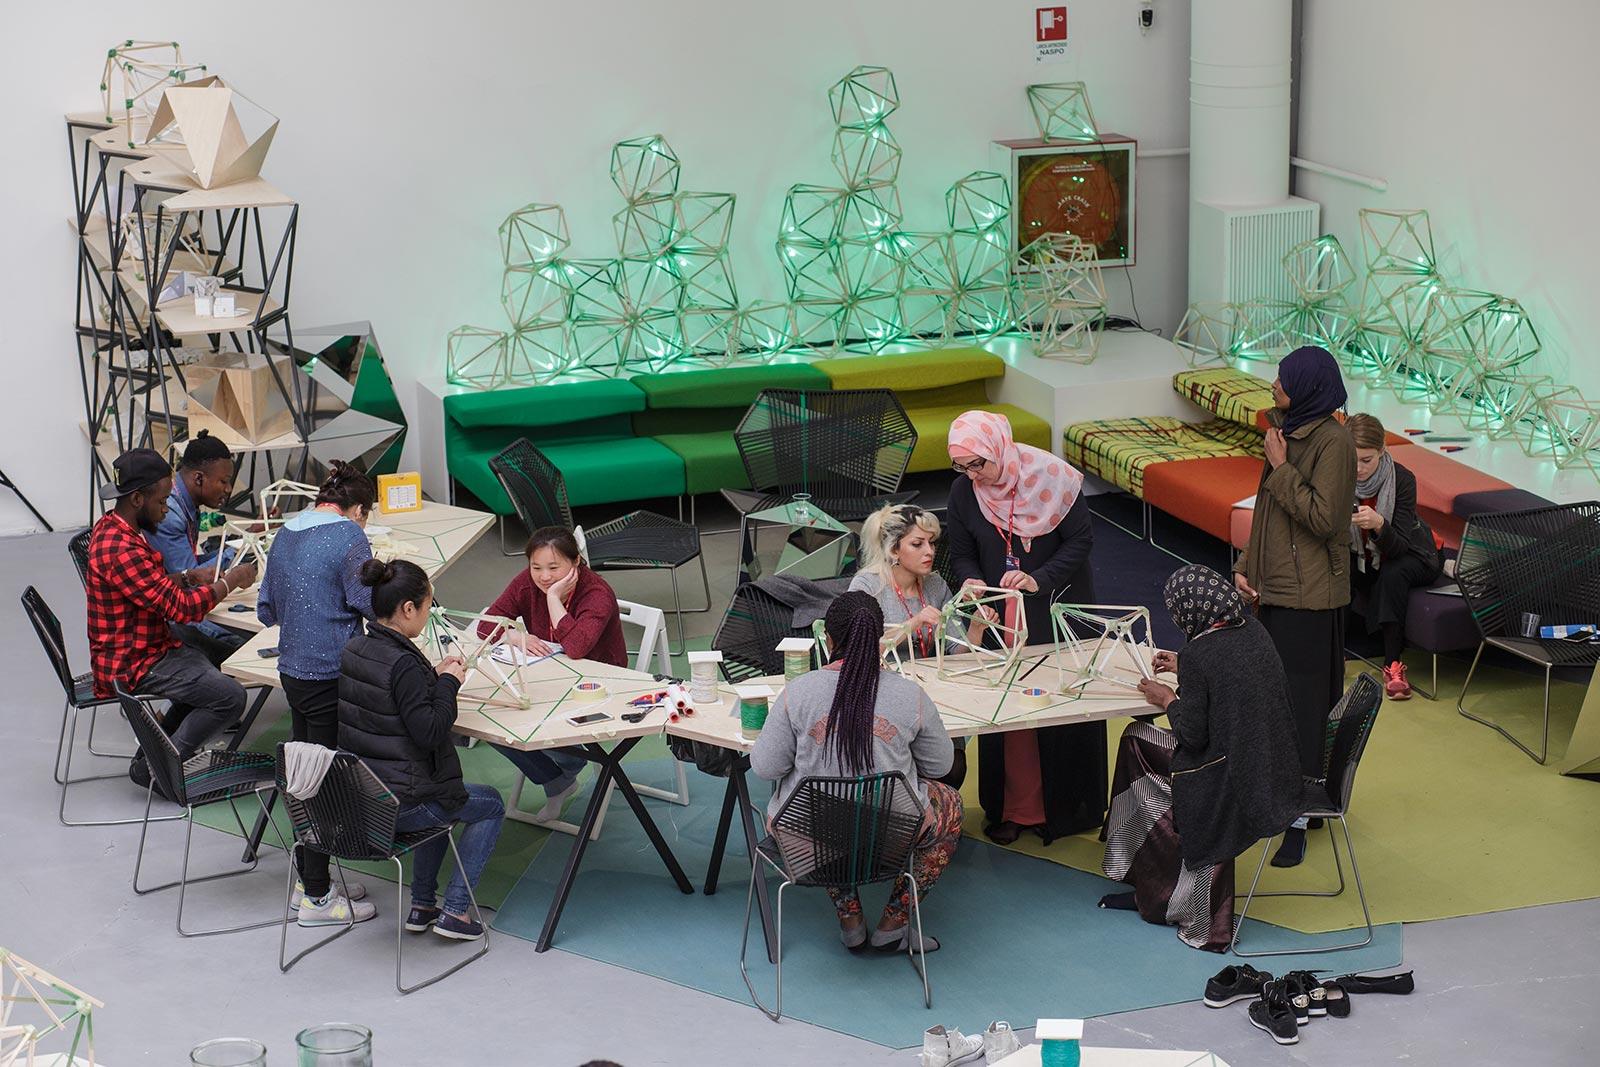 Olafur Eliasson,Green light - An artistic workshop, 2016. Photo Damir Zizic 2017